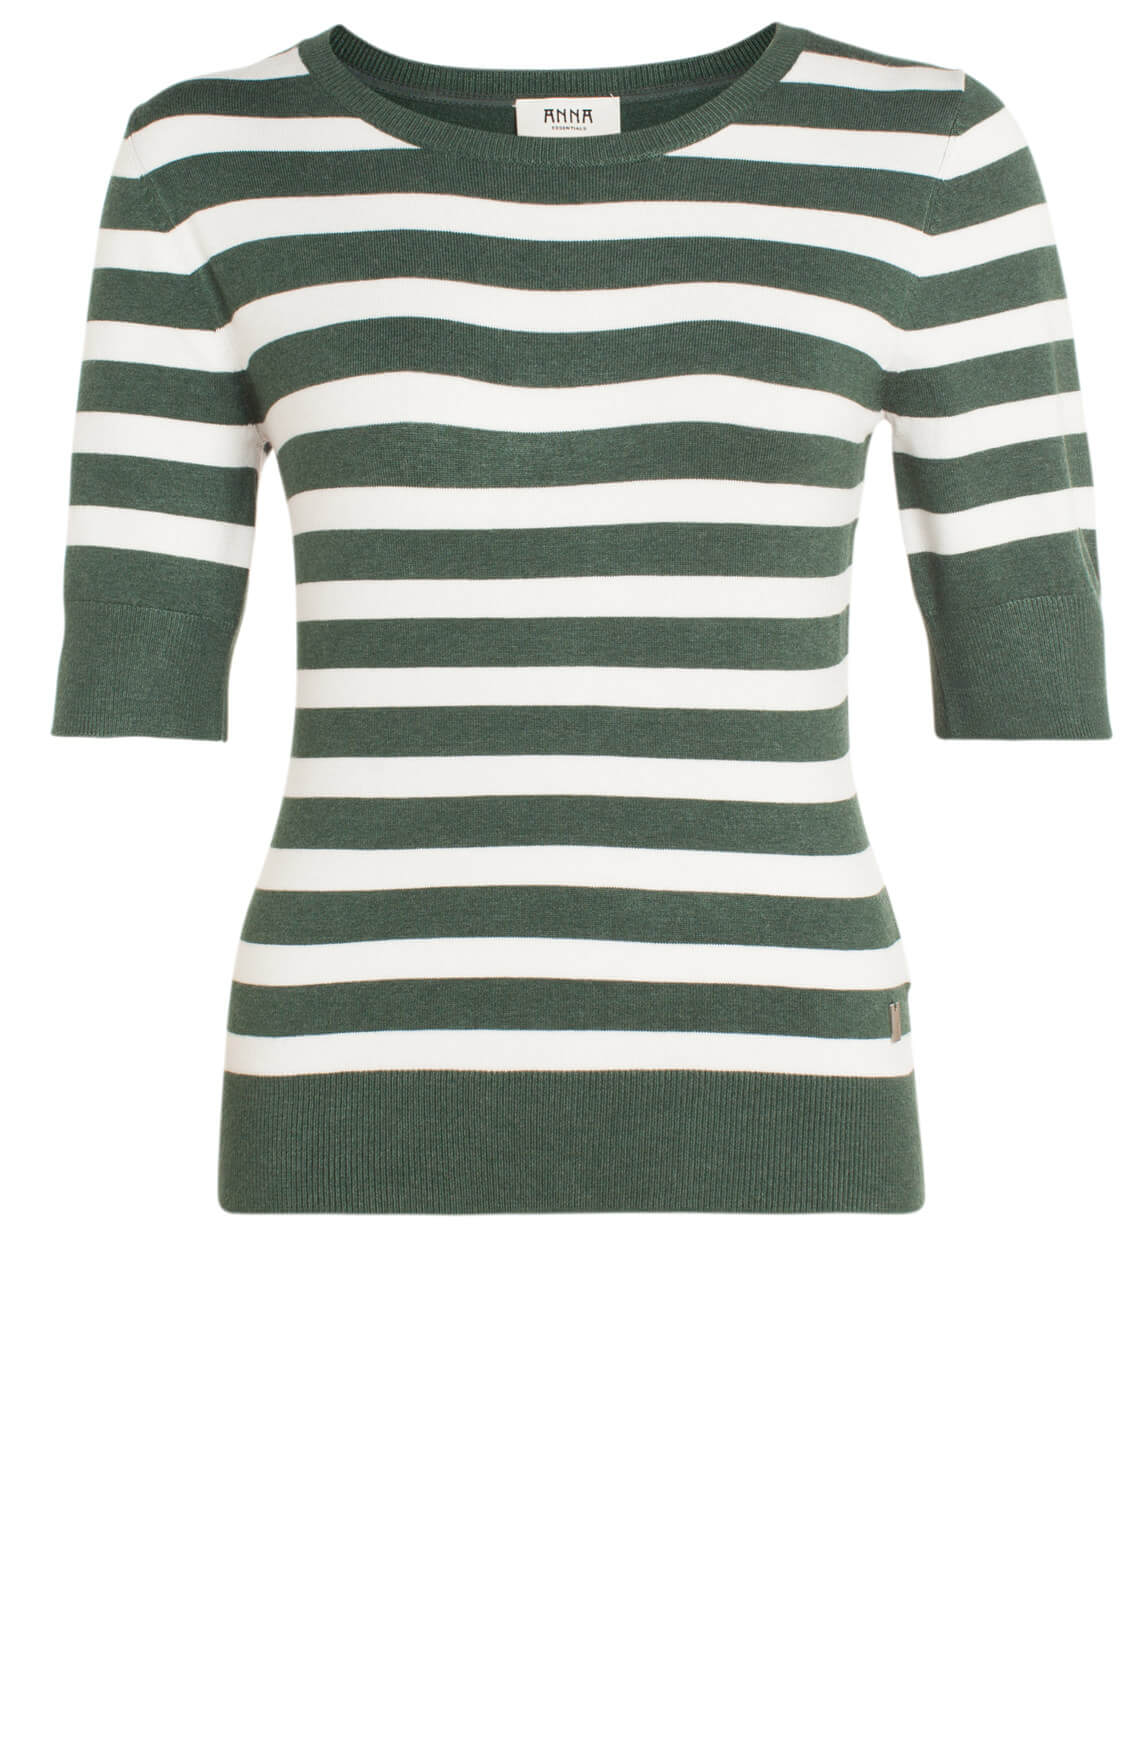 Anna Dames Gestreepte pullover groen